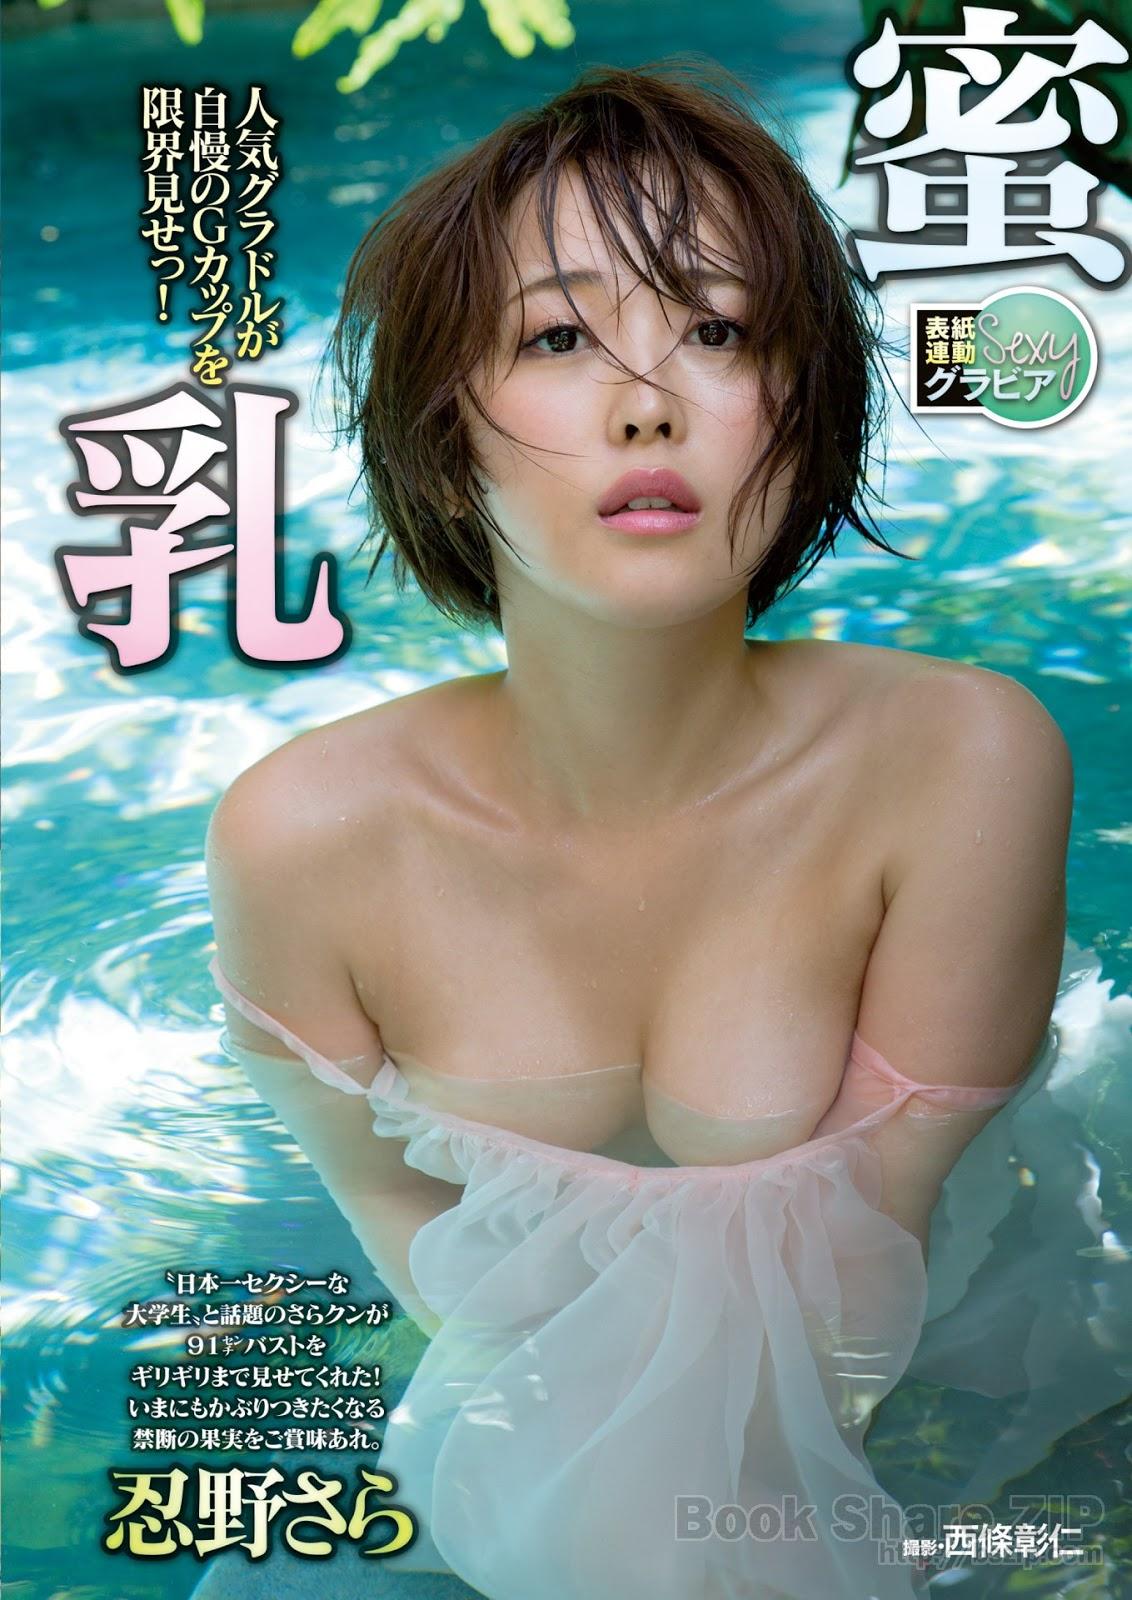 Sara Oshino 忍野さら, Shukan Jitsuwa 2017.10.05 (週刊実話 2017年10月05日号)